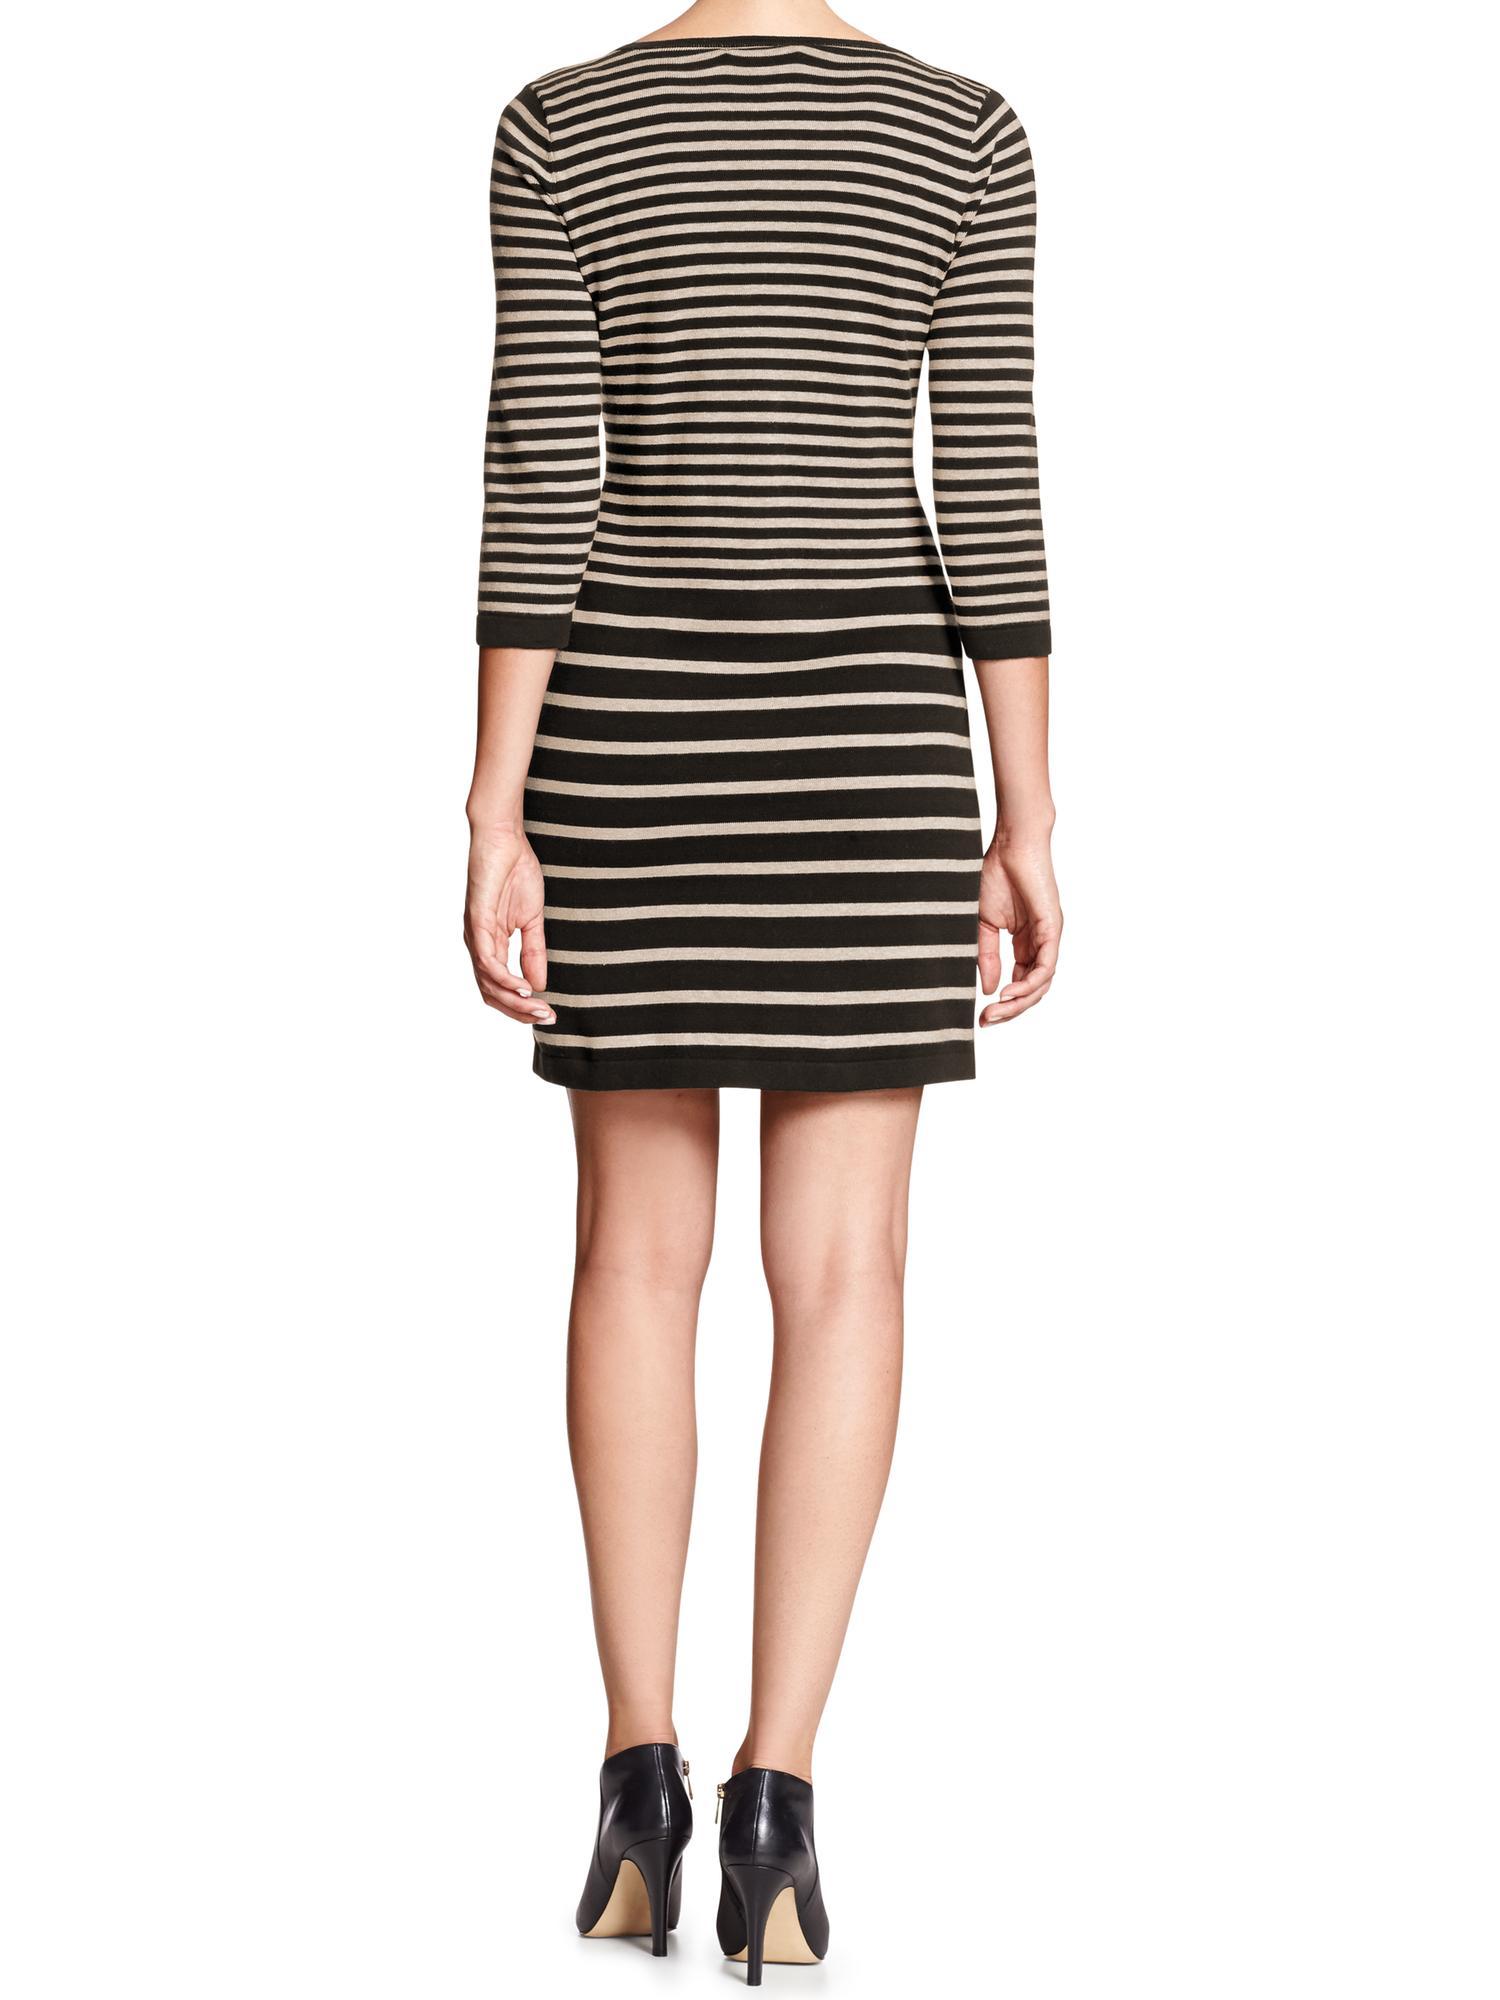 Banana Republic Factory Mixed Stripe Sweater Dress Black